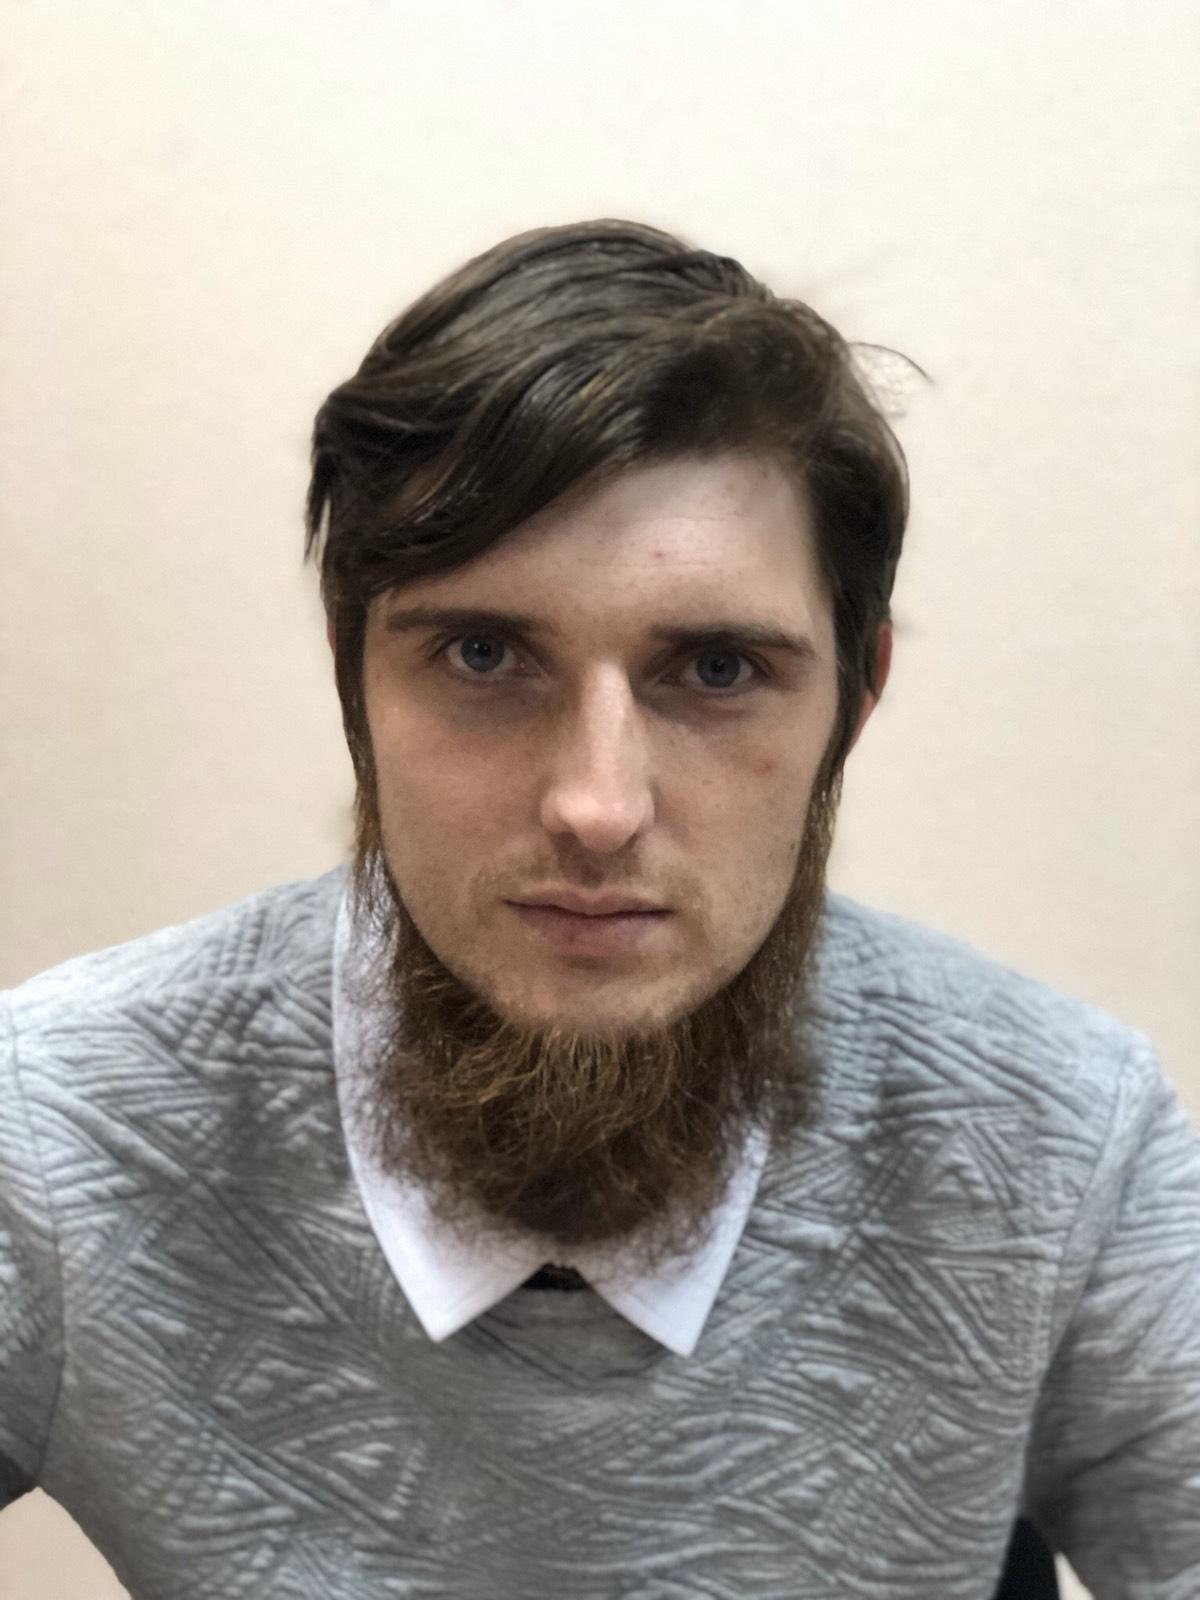 Worker: Зеленов Александр Юрьевич